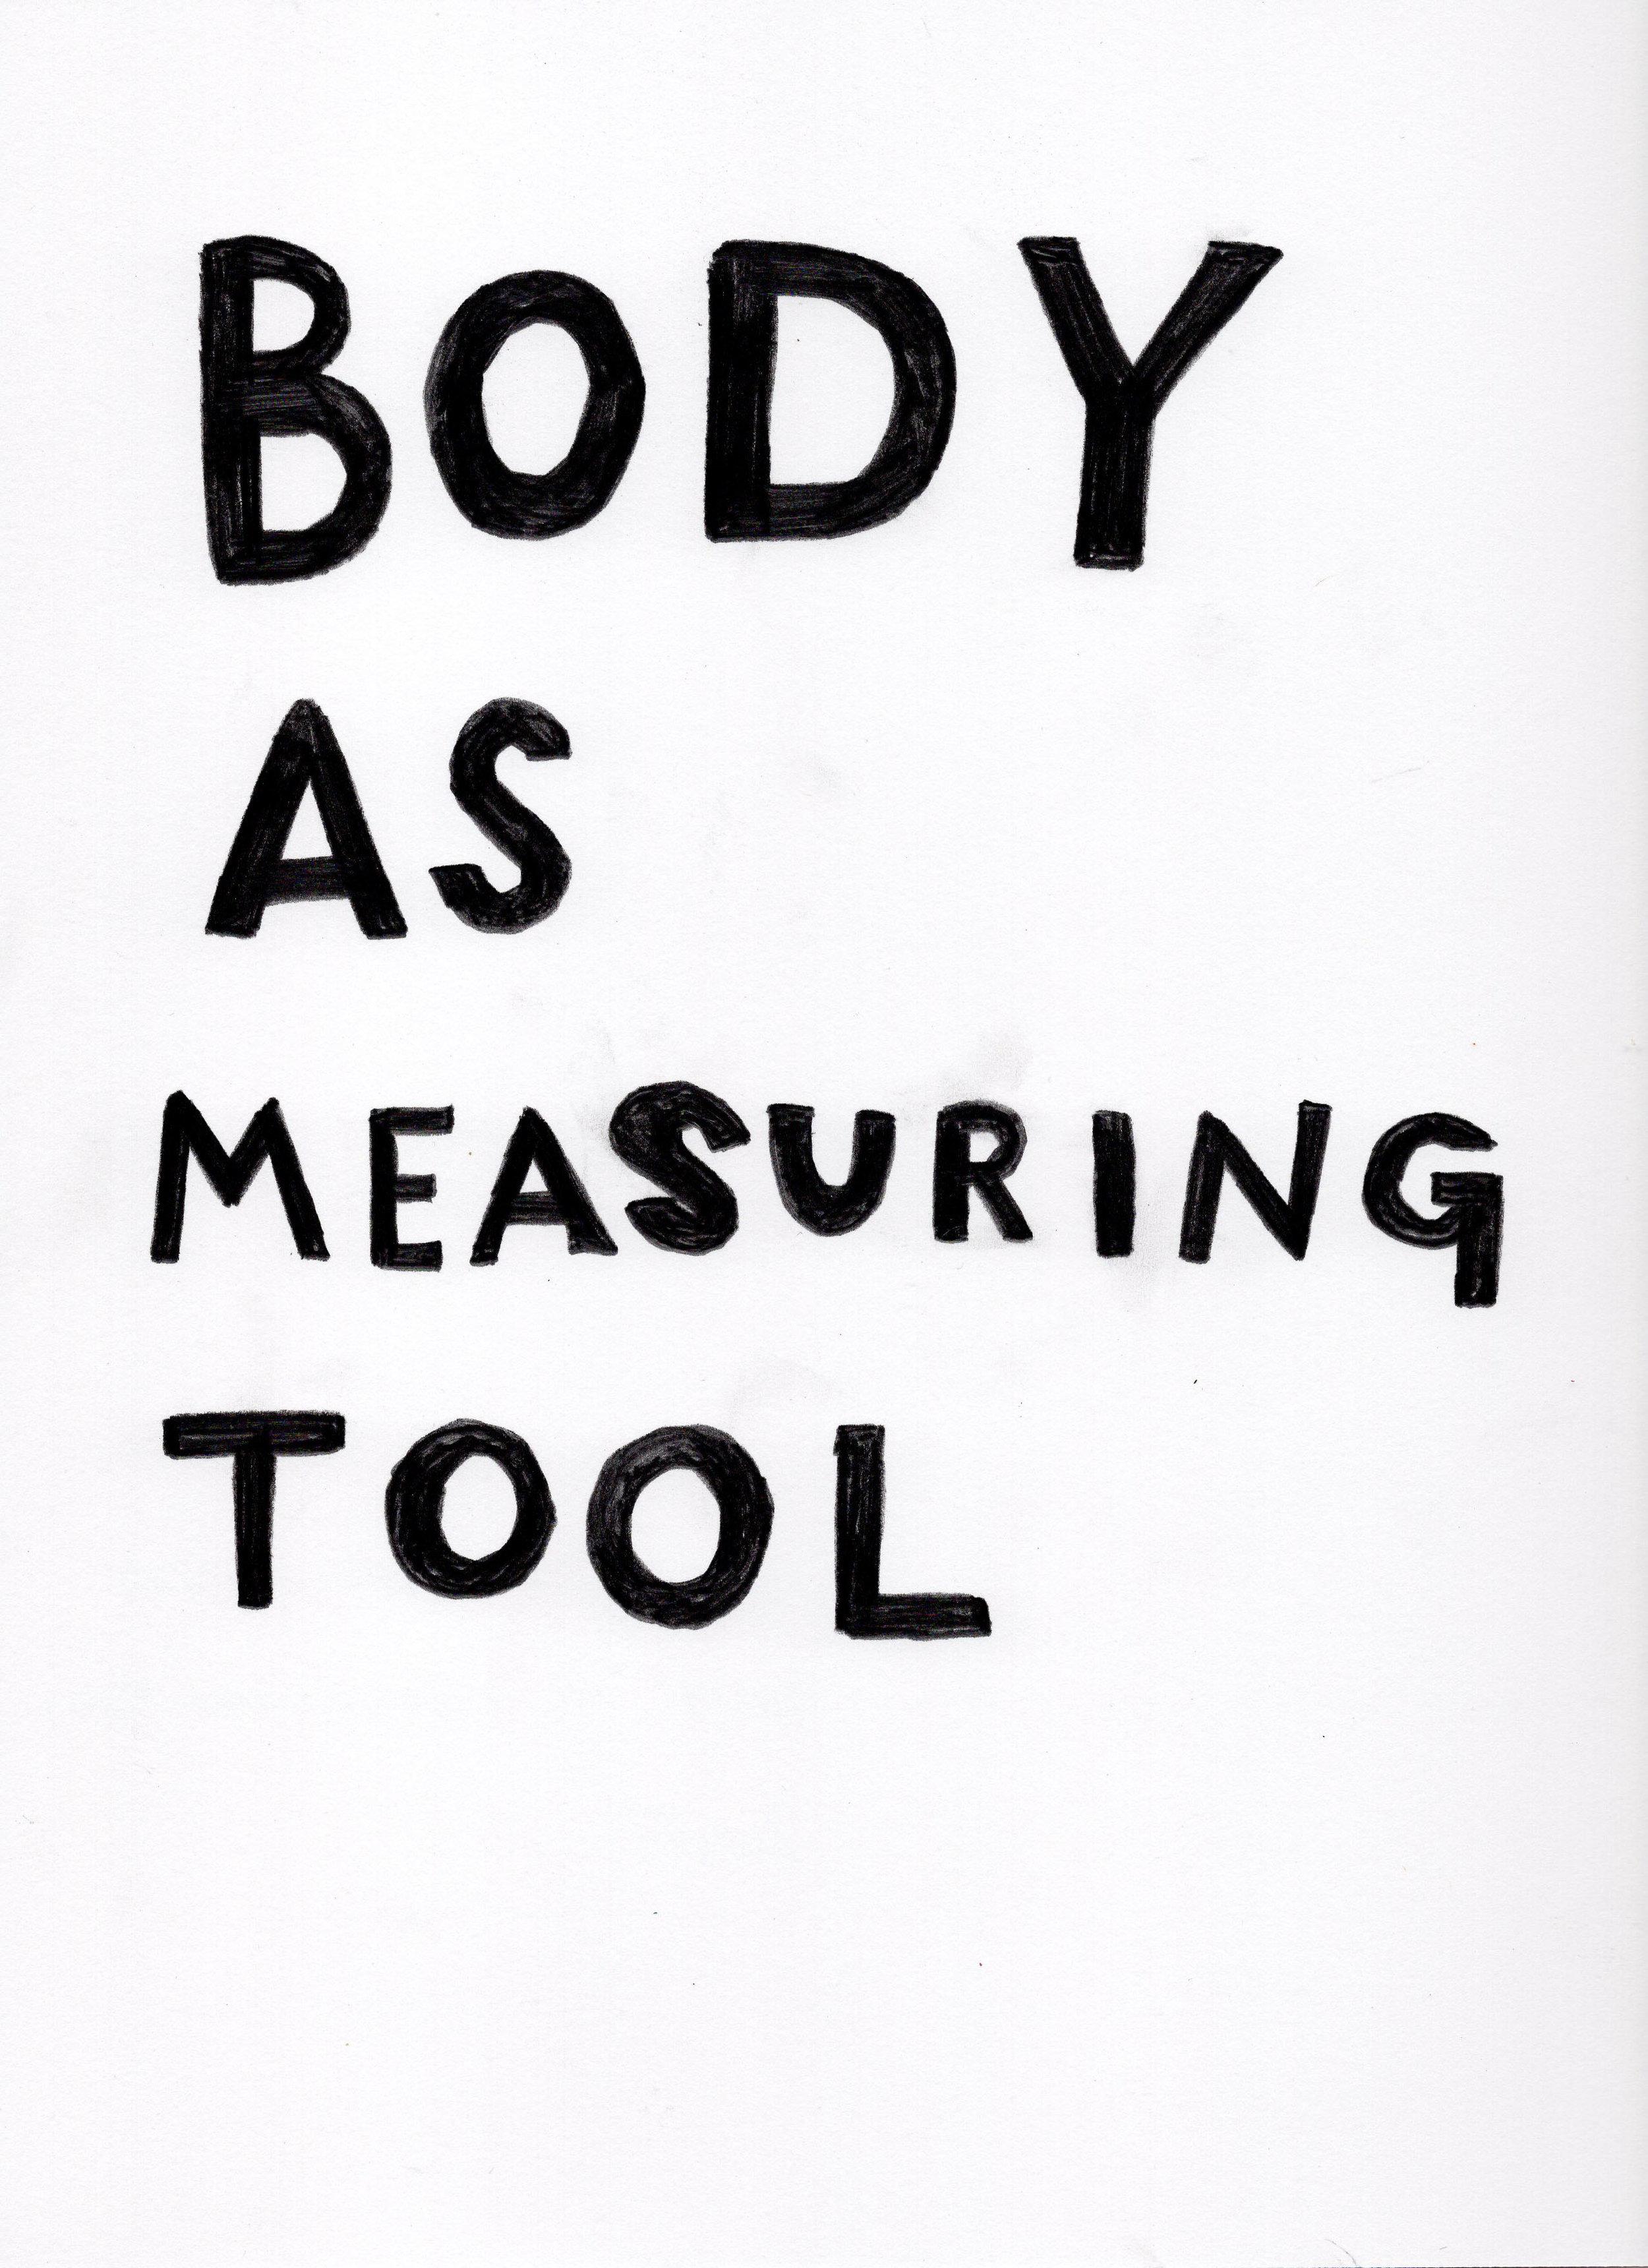 BodyAsMeasuringTool_2015.jpg